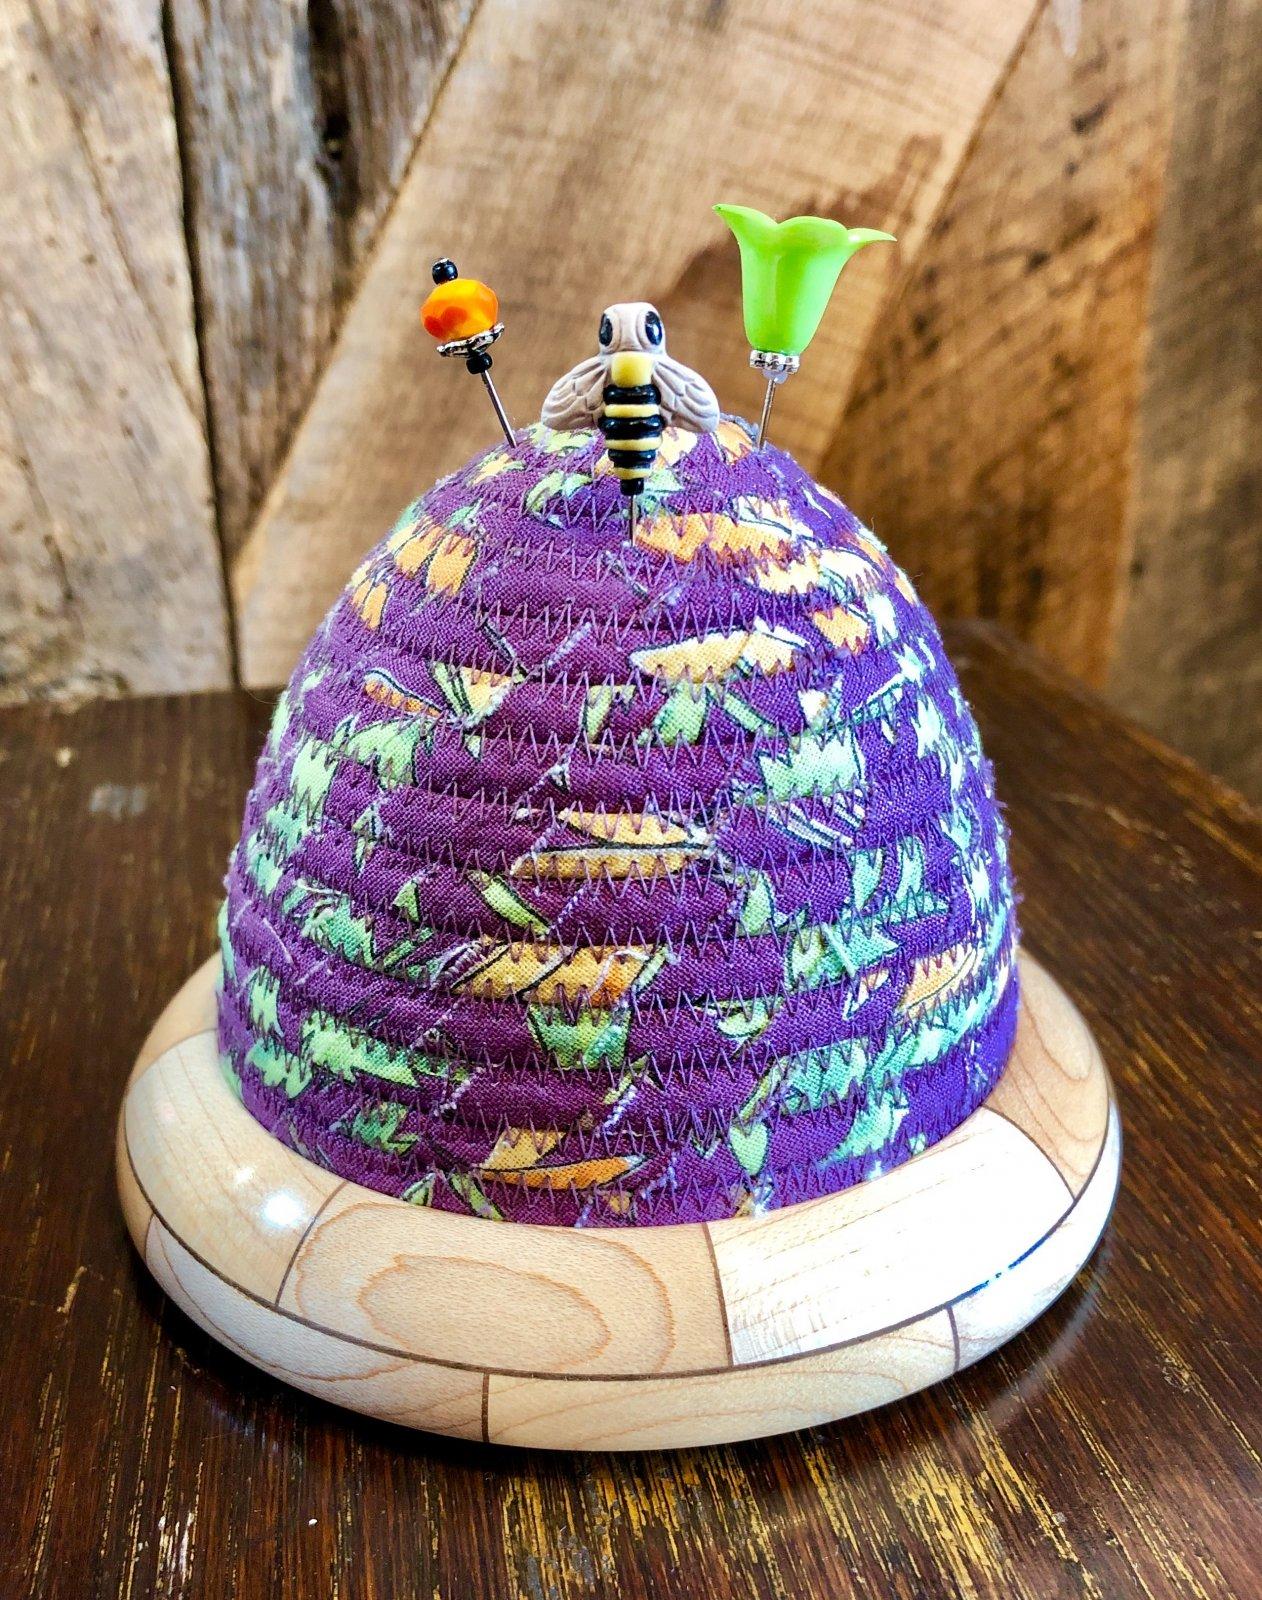 Beehive Pincushion - Laura Heine - Plum Floral Top - Maple / Walnut Base